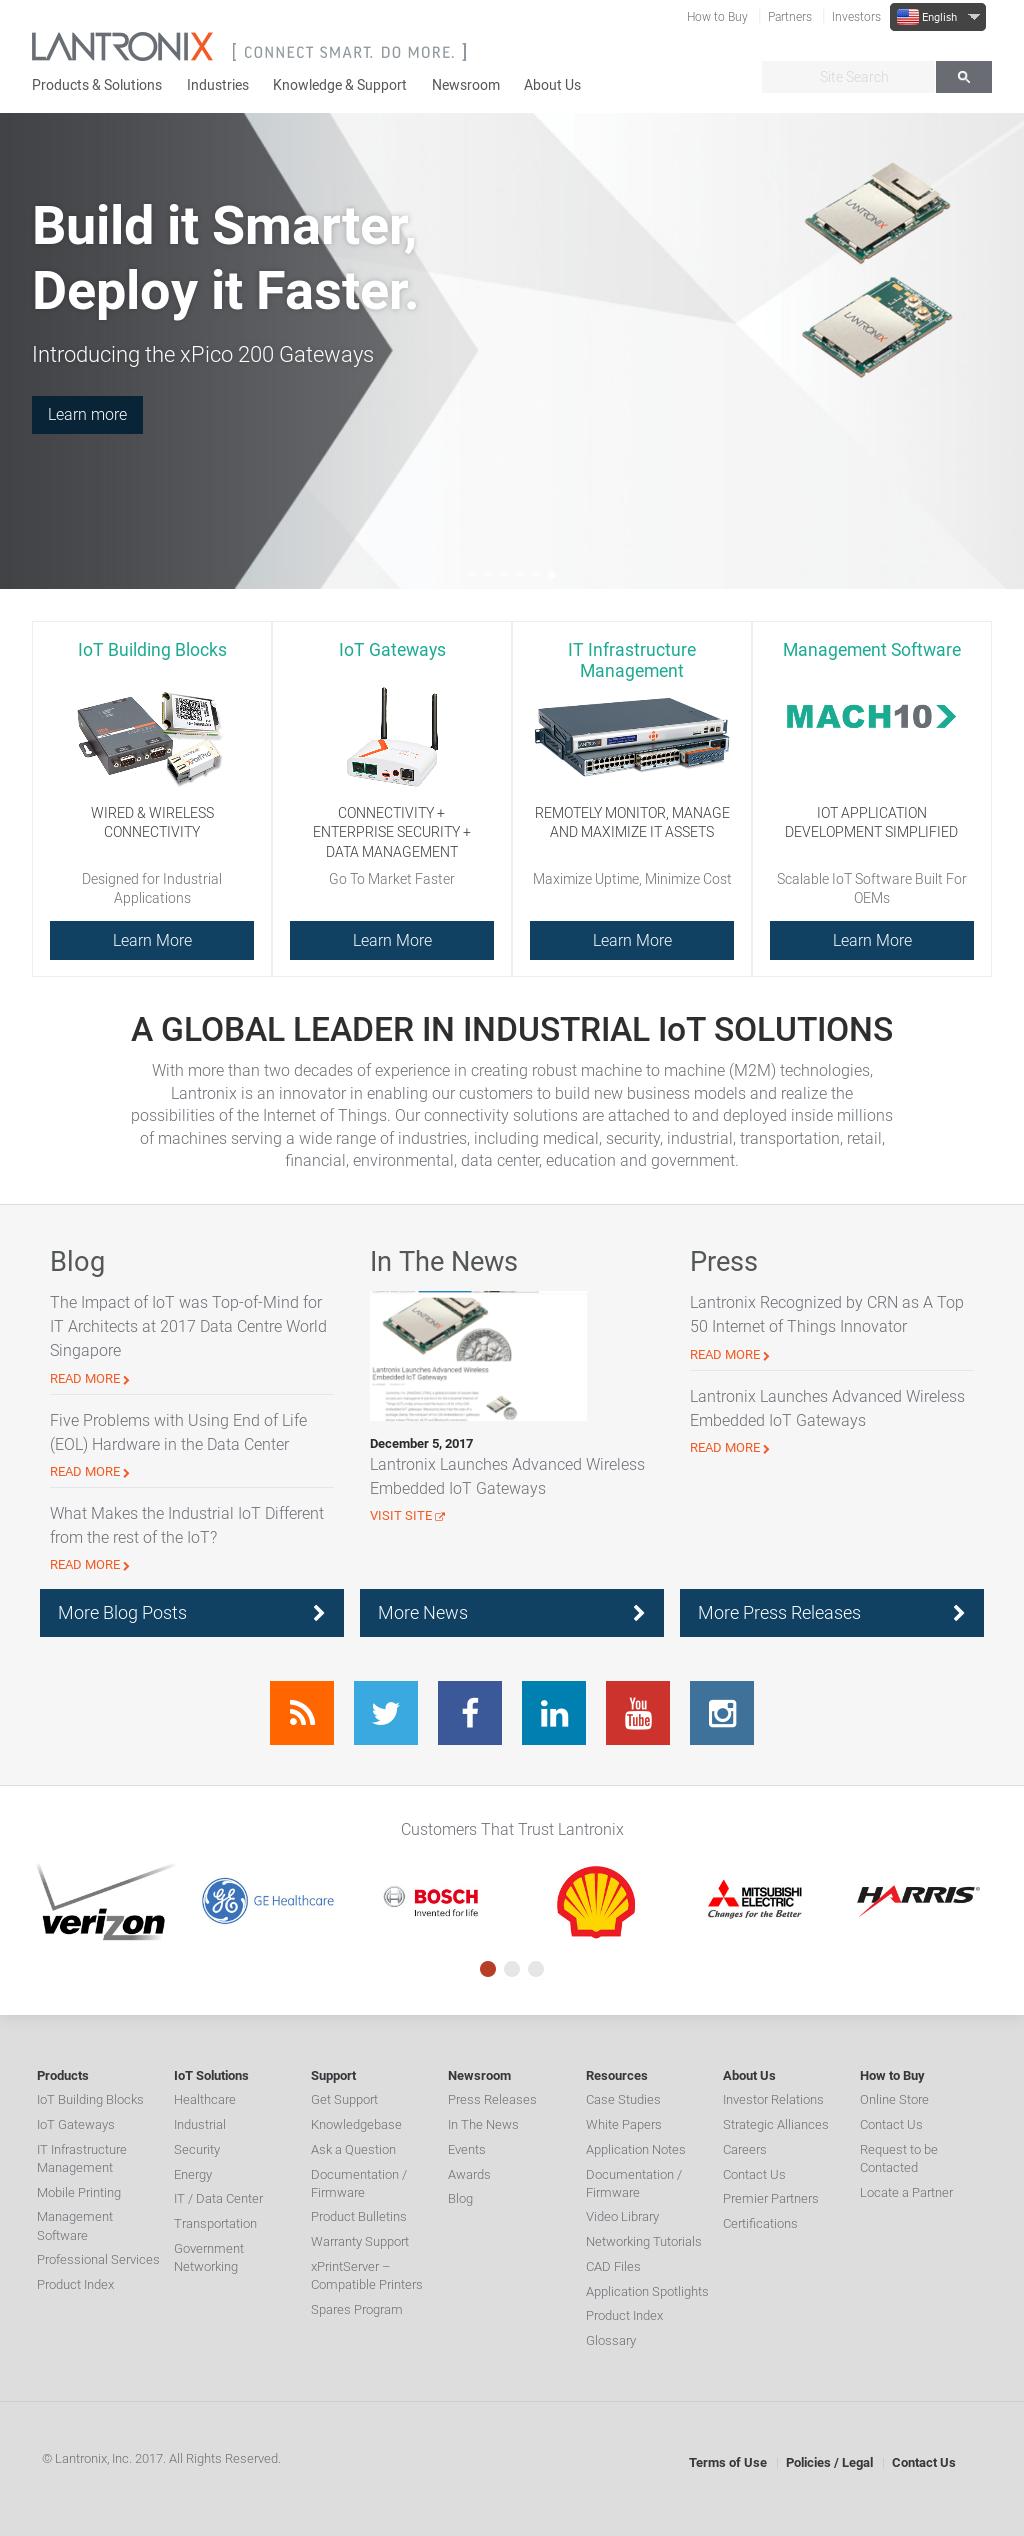 Lantronix Competitors, Revenue and Employees - Owler Company Profile